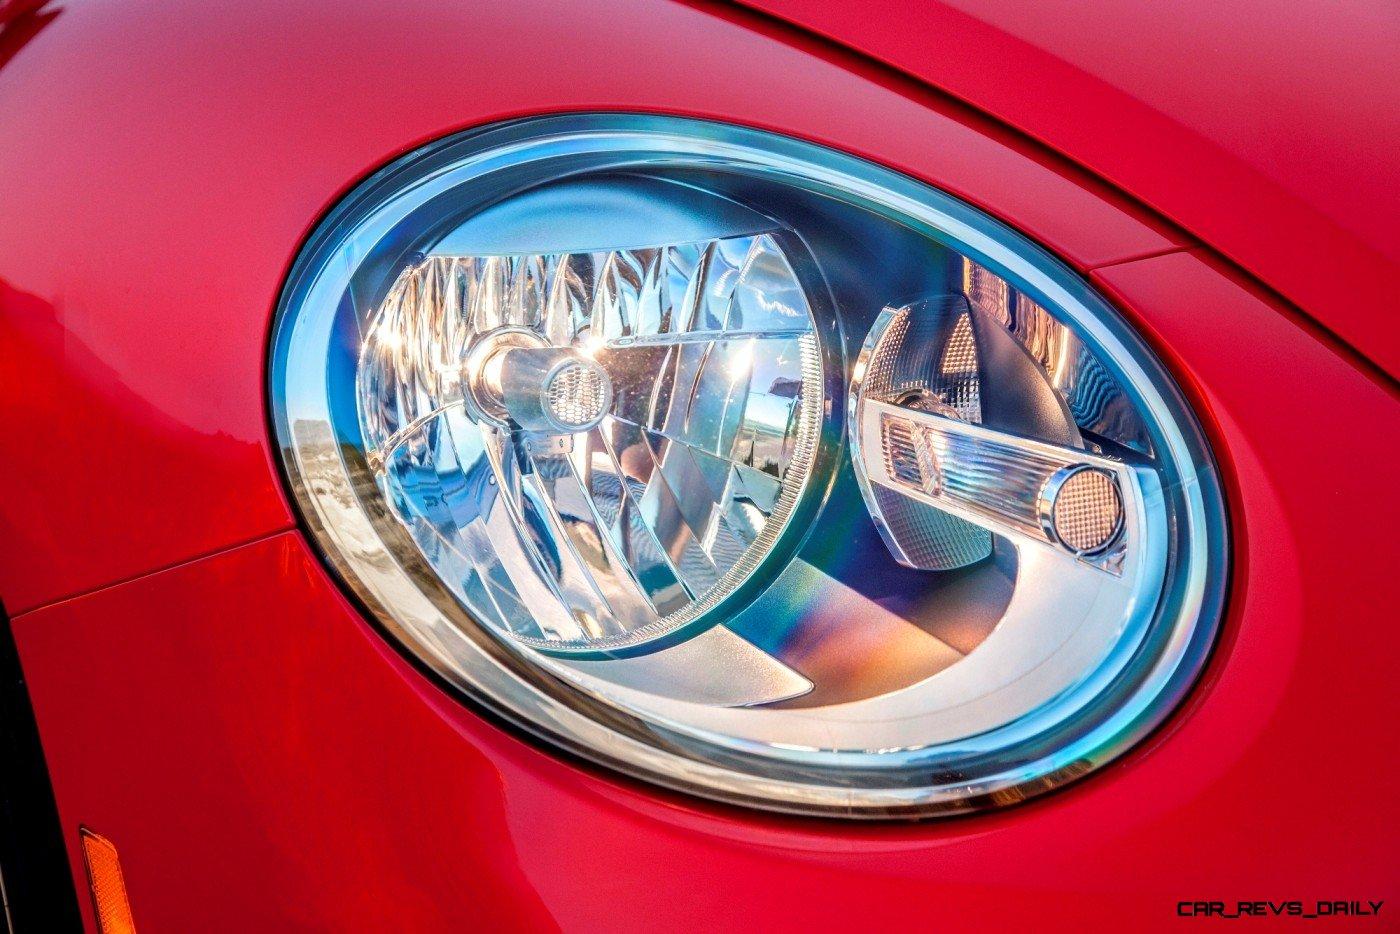 CarRevsDaily.com - 2014 VW Beetle Cabrio in Santa Monica 18